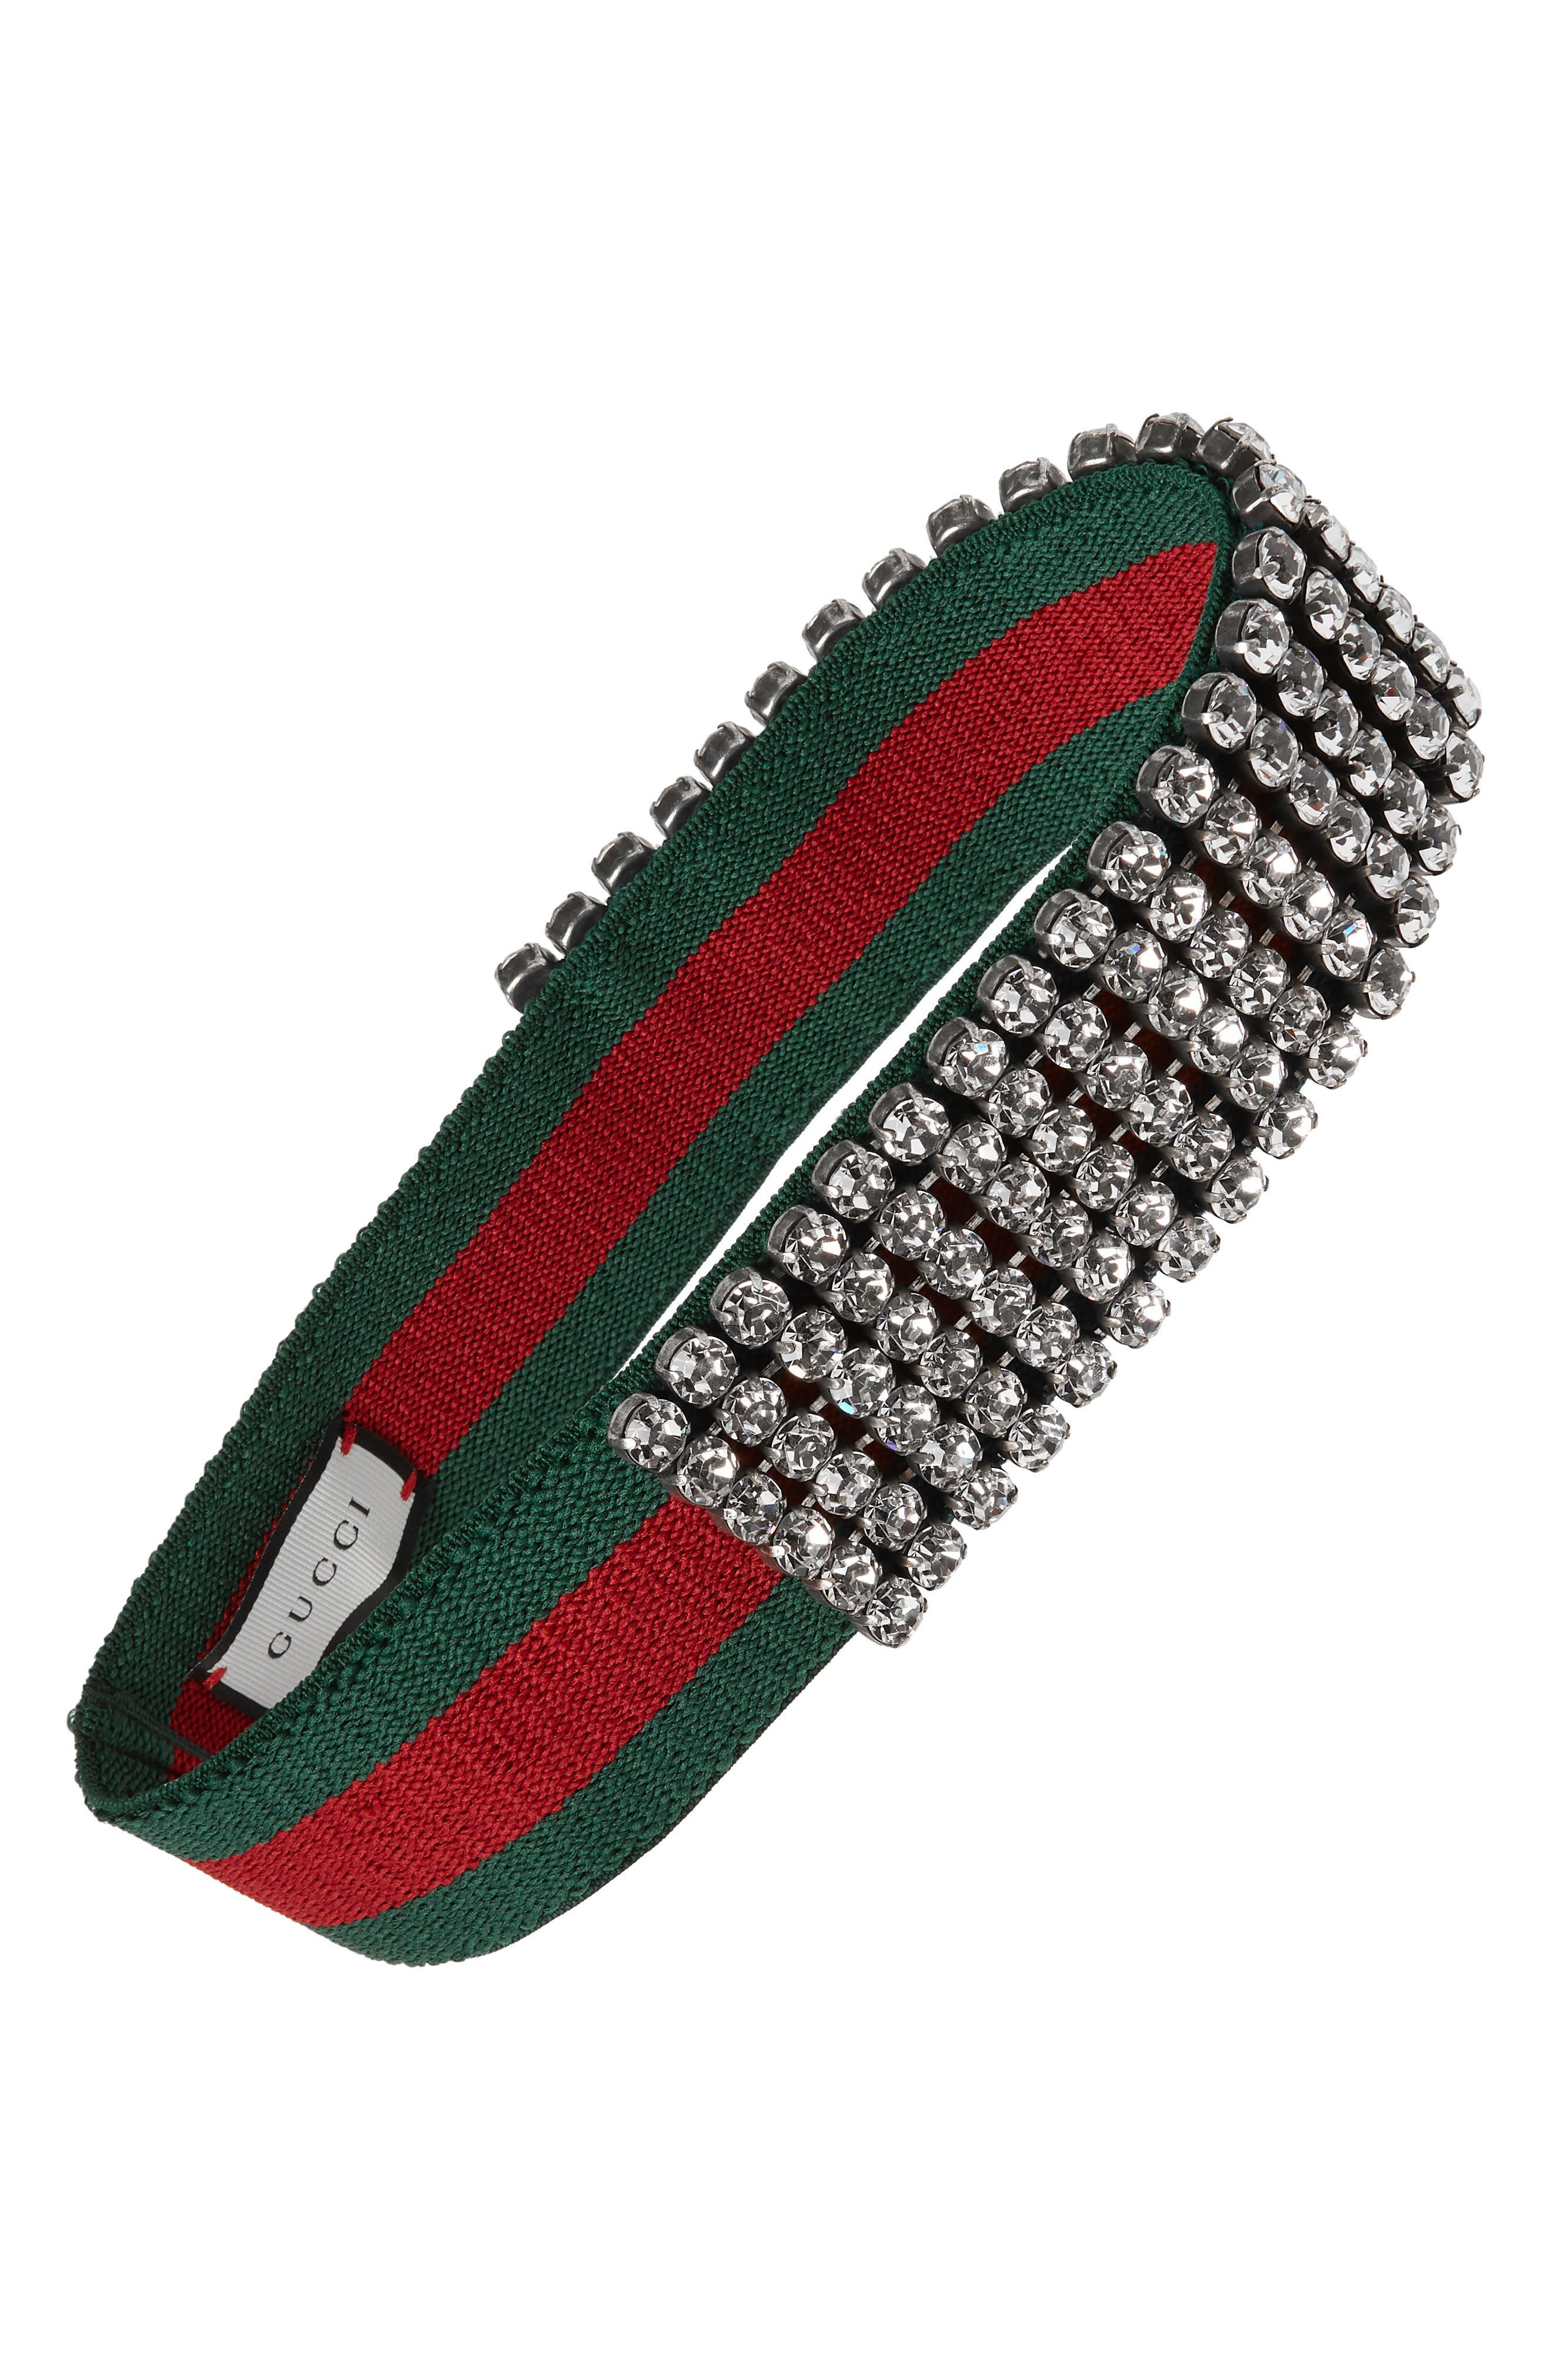 Webby Crystal Headband,                         Main,                         color, DARK GREEN BOTTLE/ RED